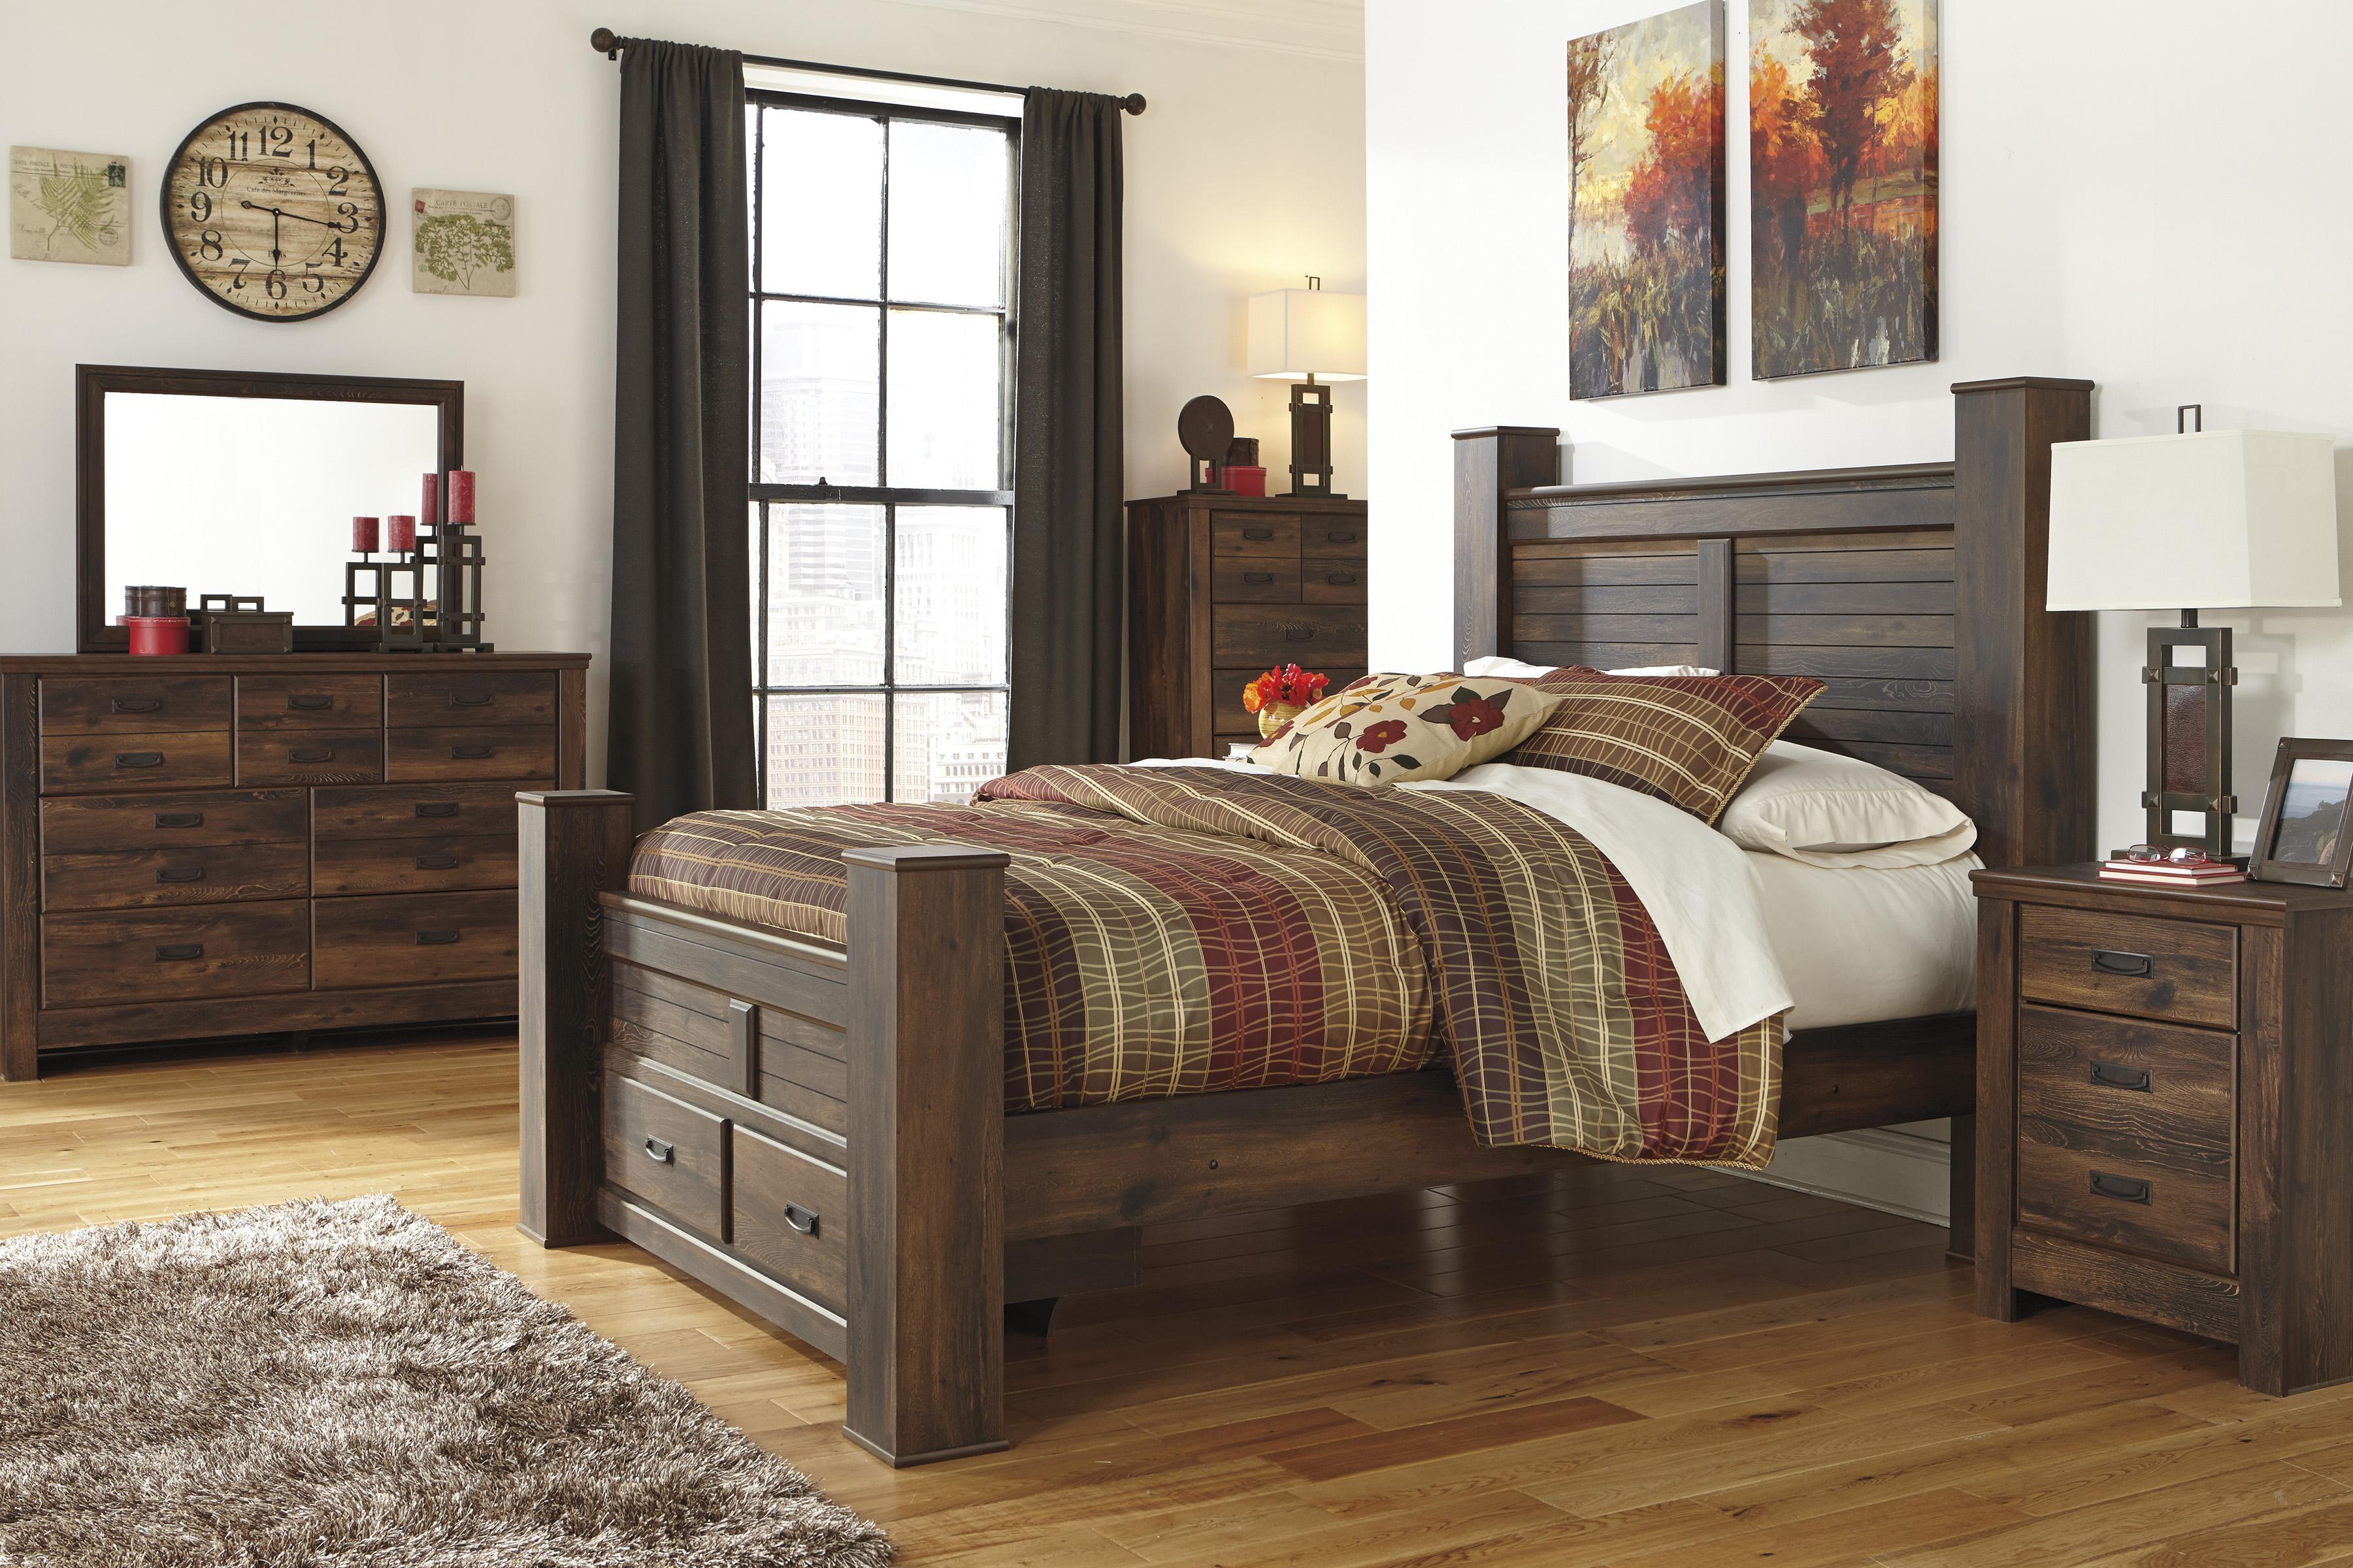 Ashley rustic bedroom furniture - Signature Design By Ashley Furniture Quinden Rustic Queen Poster Bed Sam S Appliance Furniture Headboard Footboard